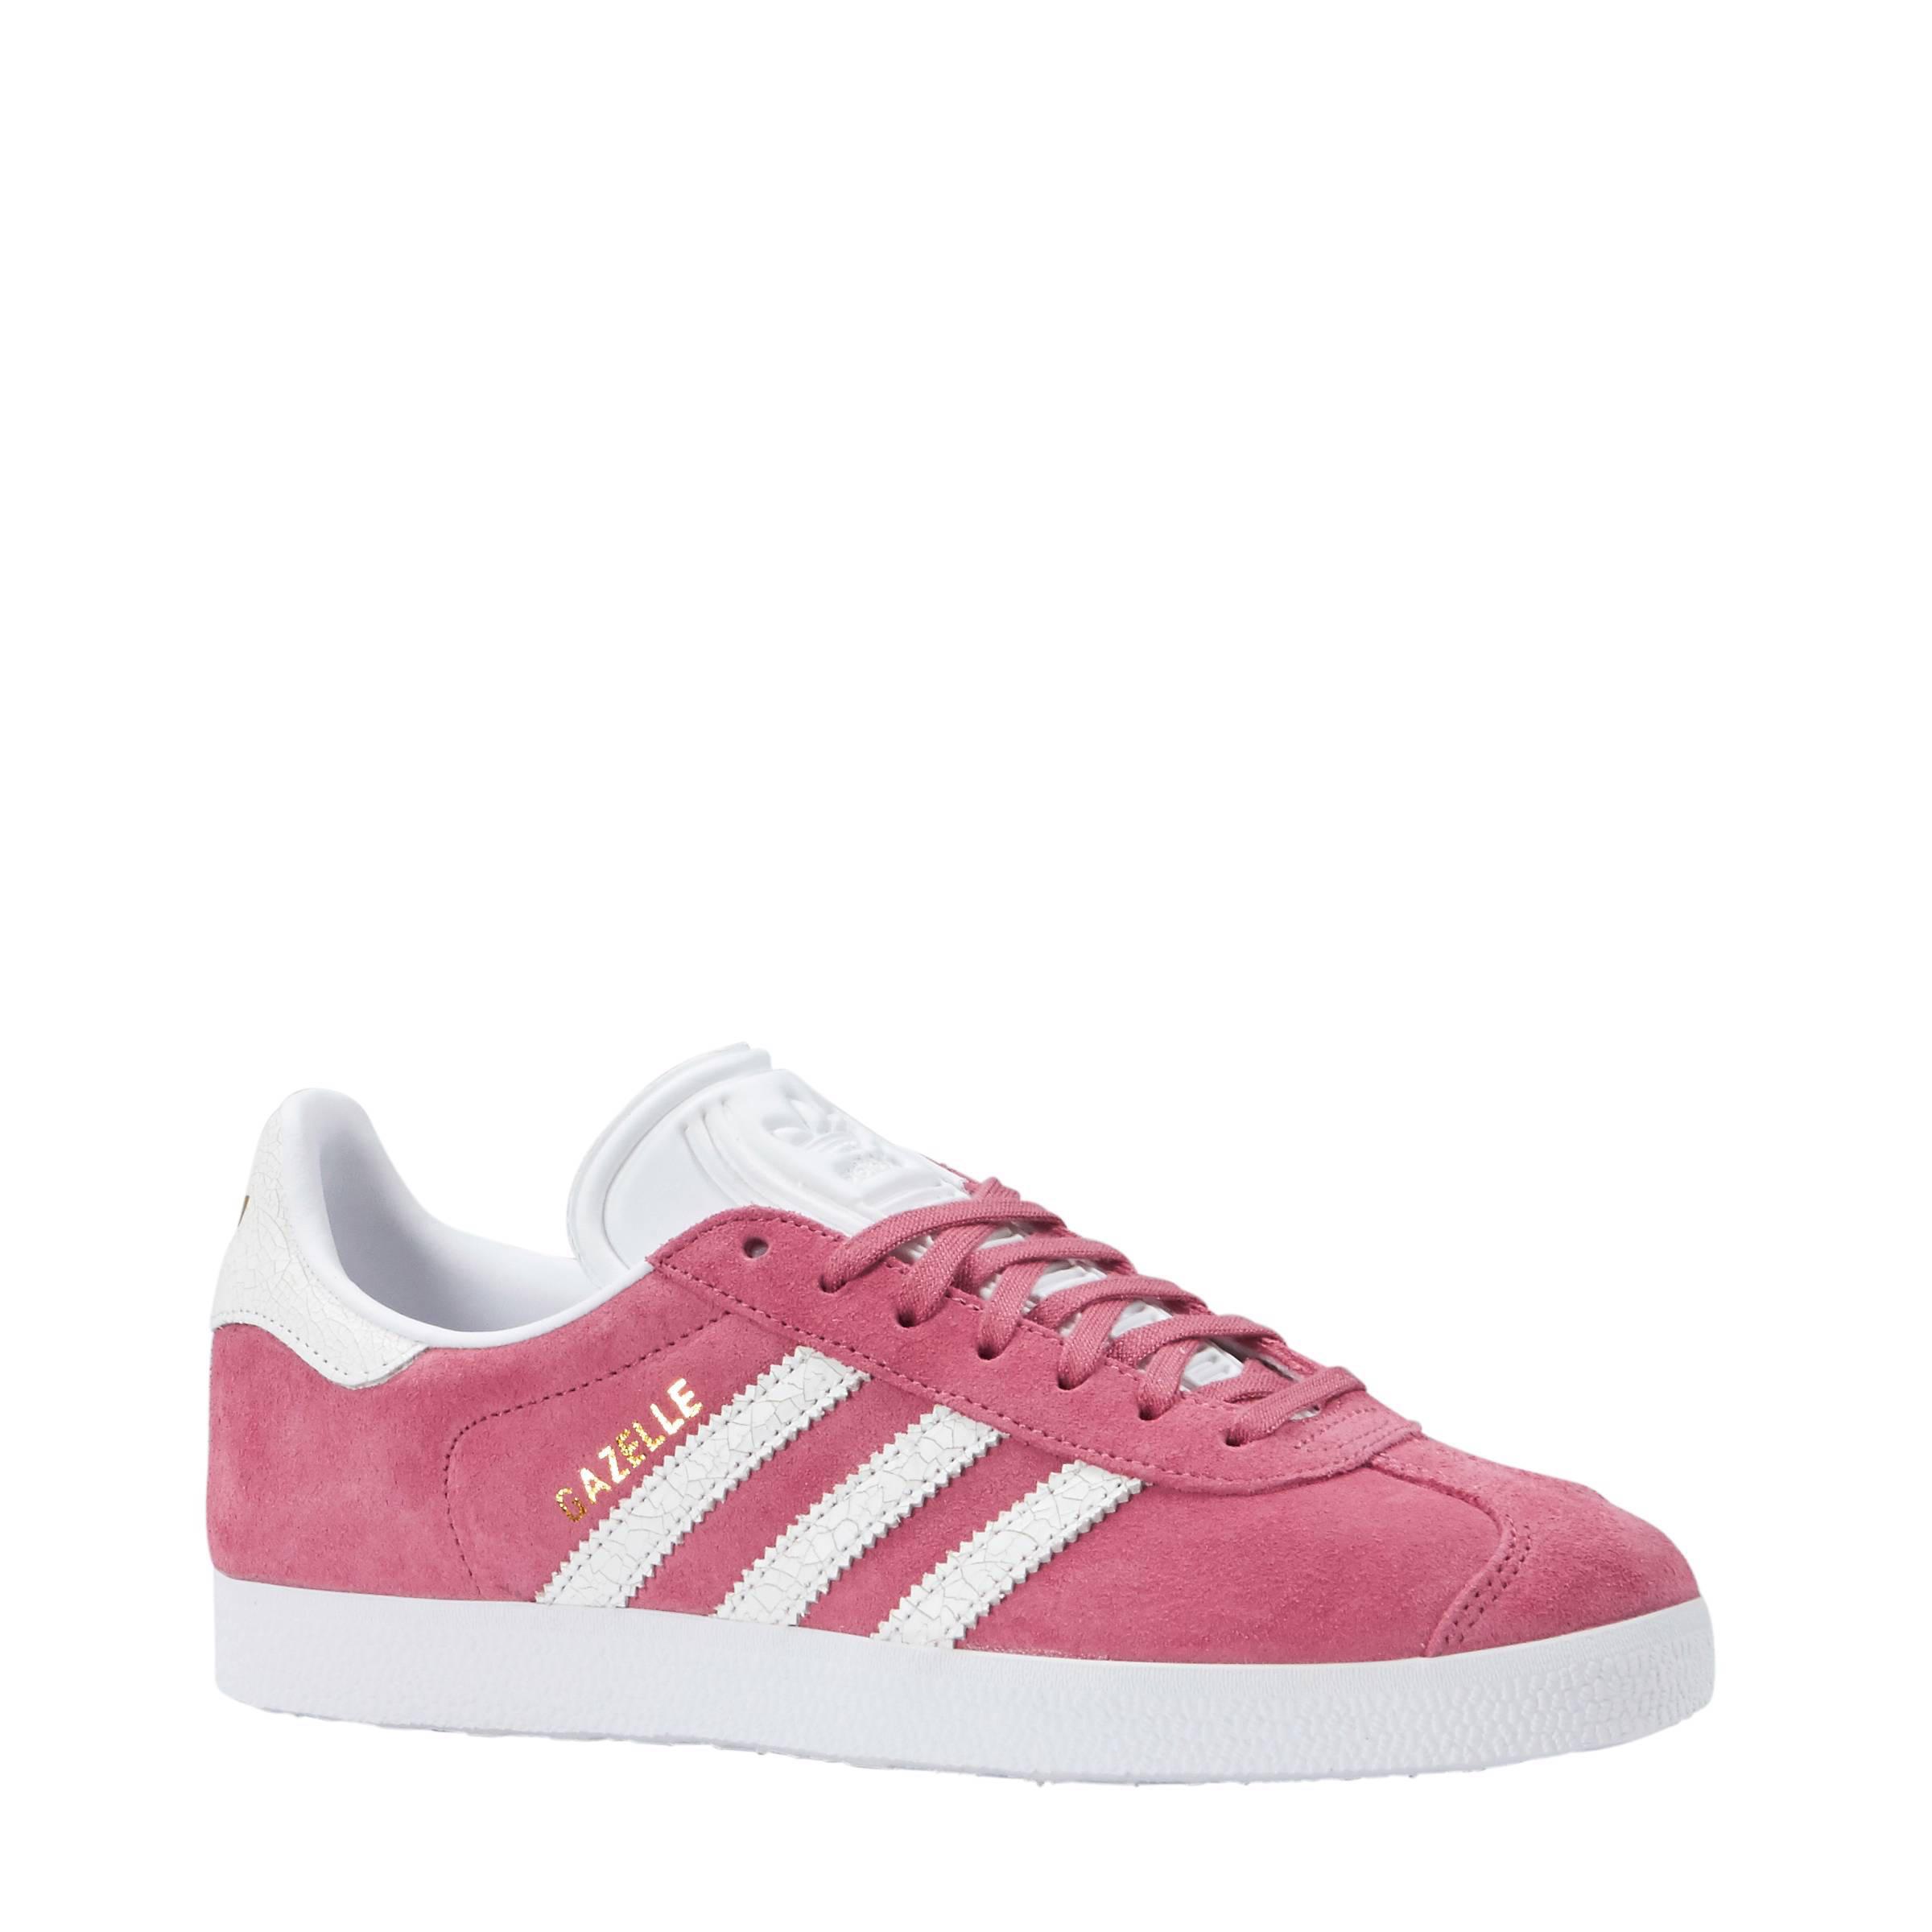 adidas gazelle roze wit